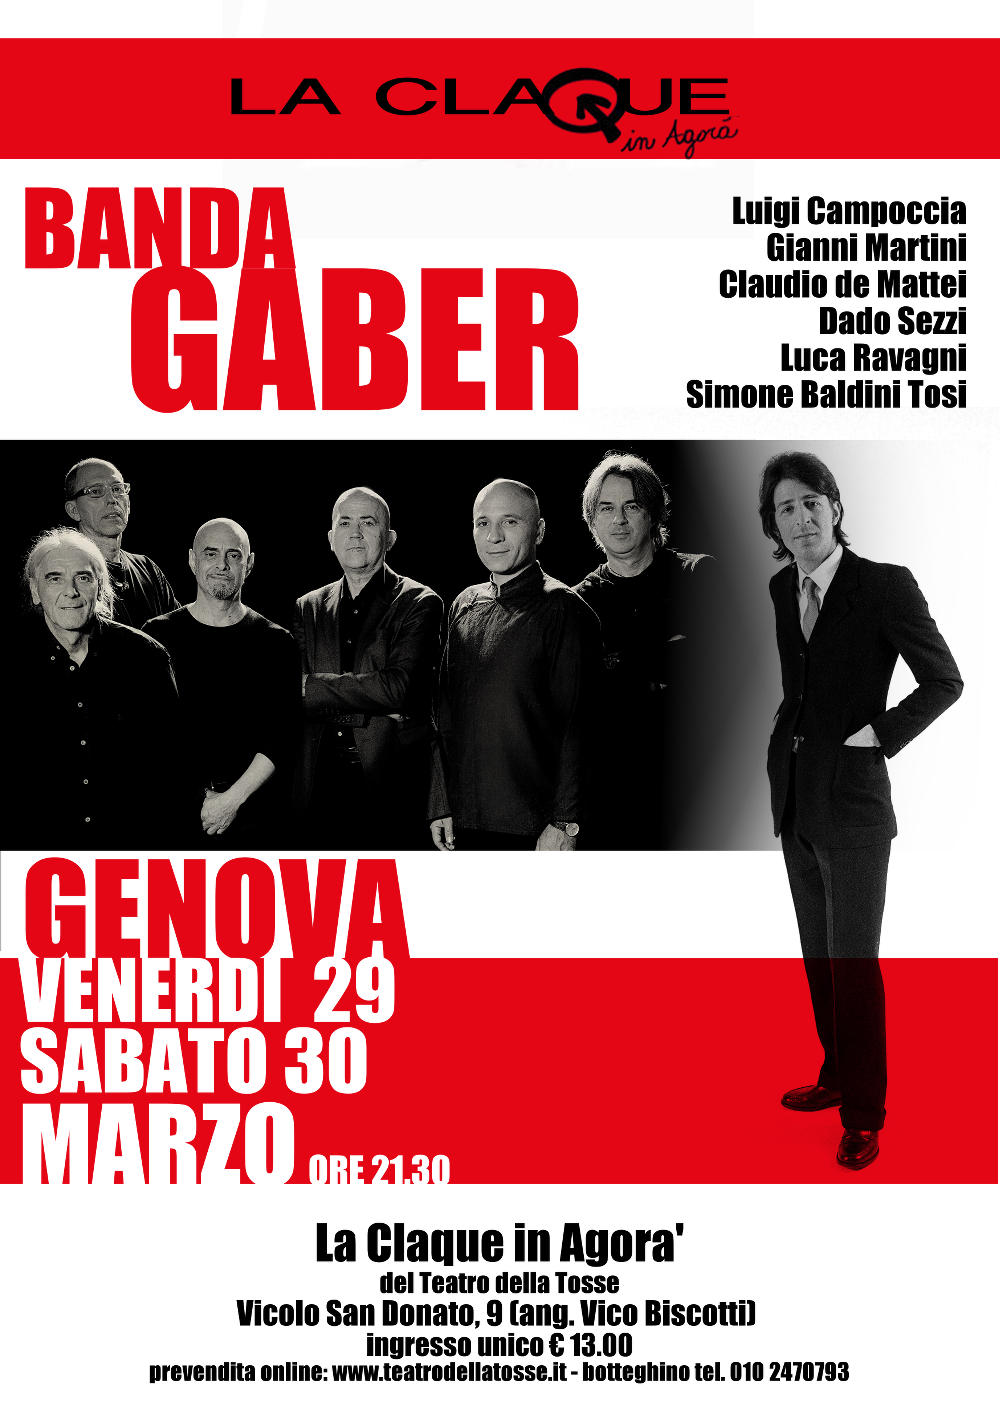 30 MARZO BANDA GABER - GENOVA